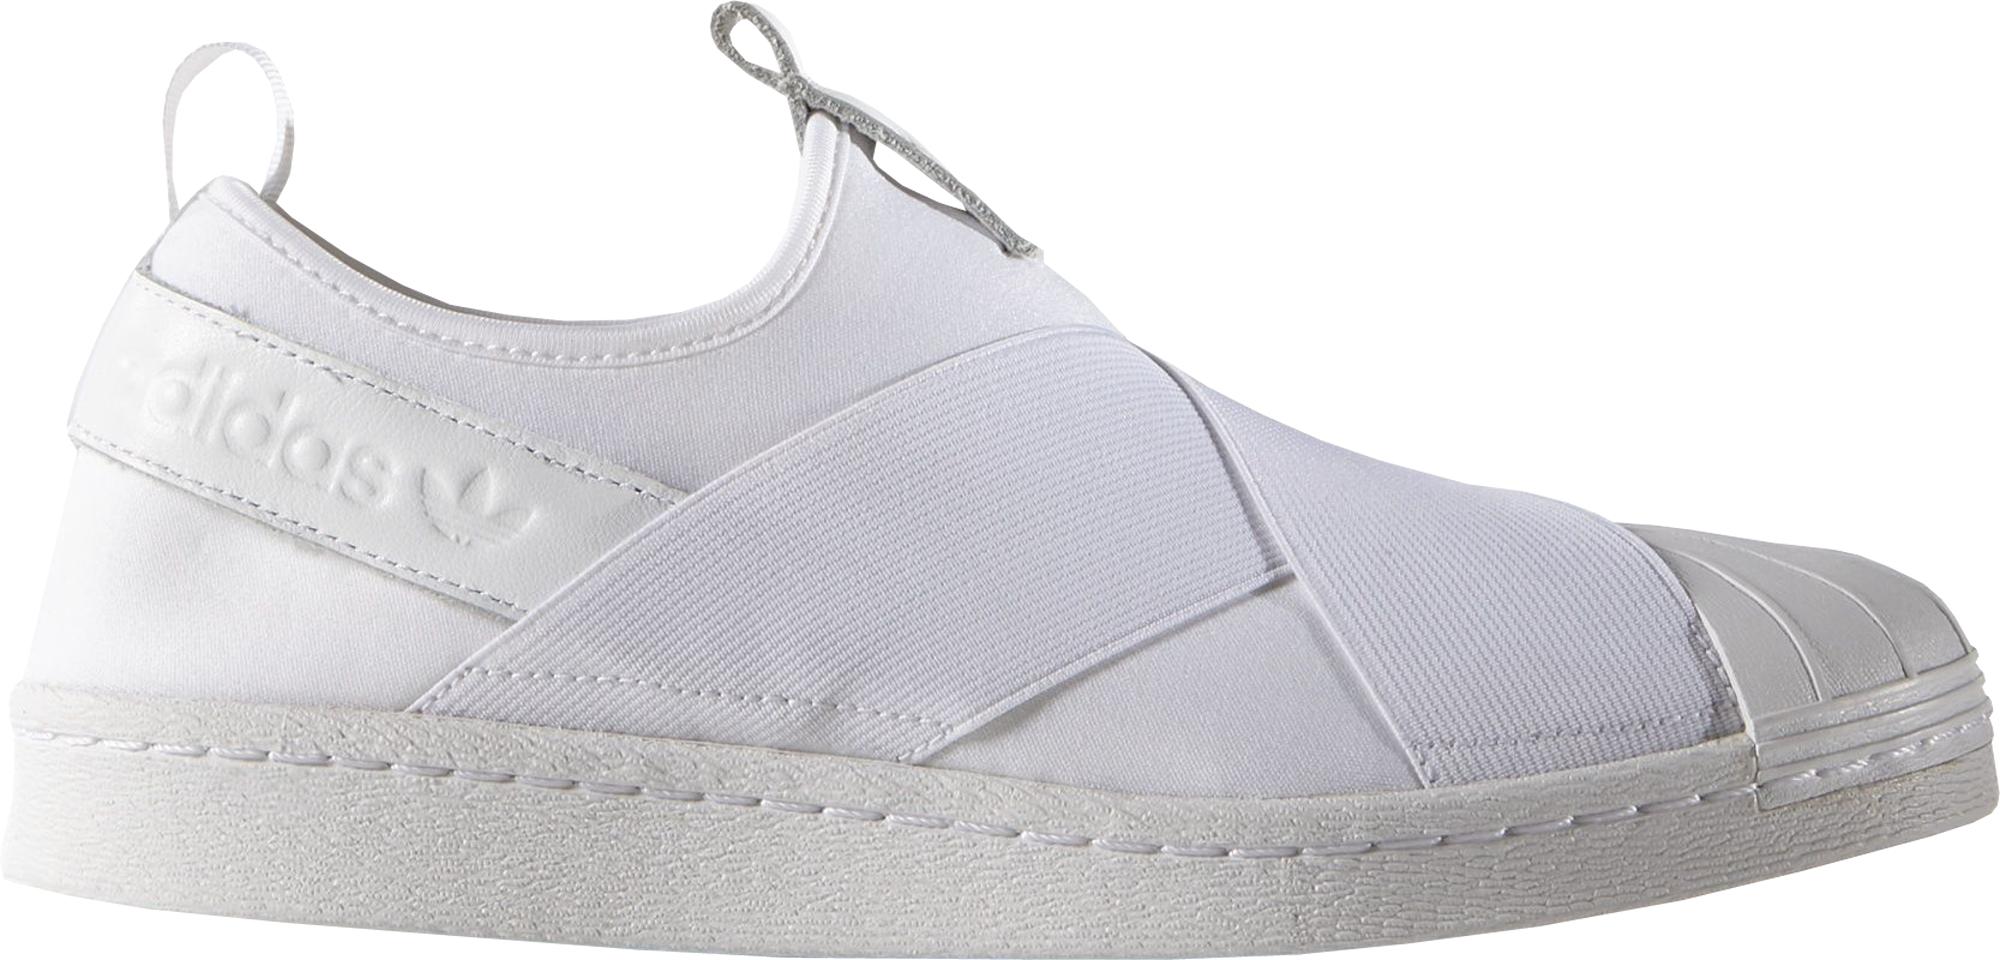 adidas all white slip on